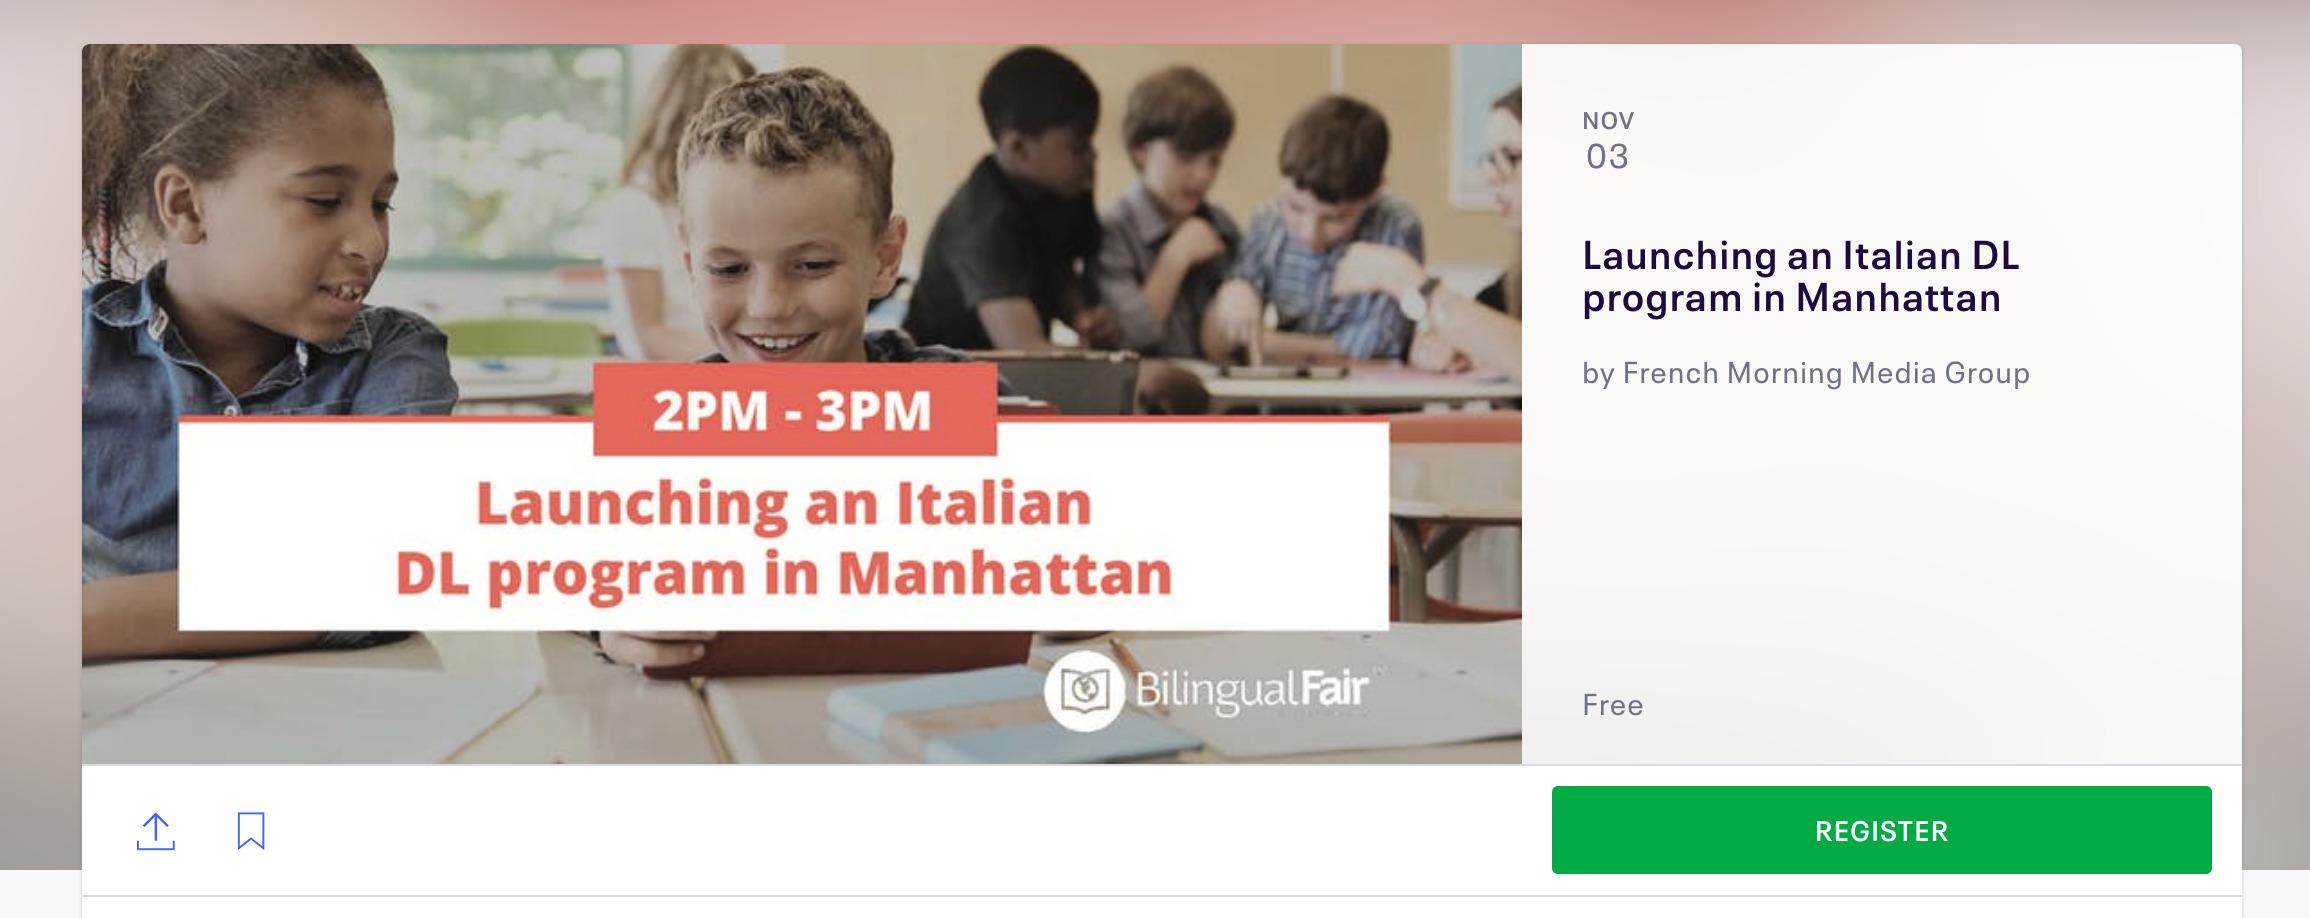 Launching an Italian DL program in Manhattan.jpg